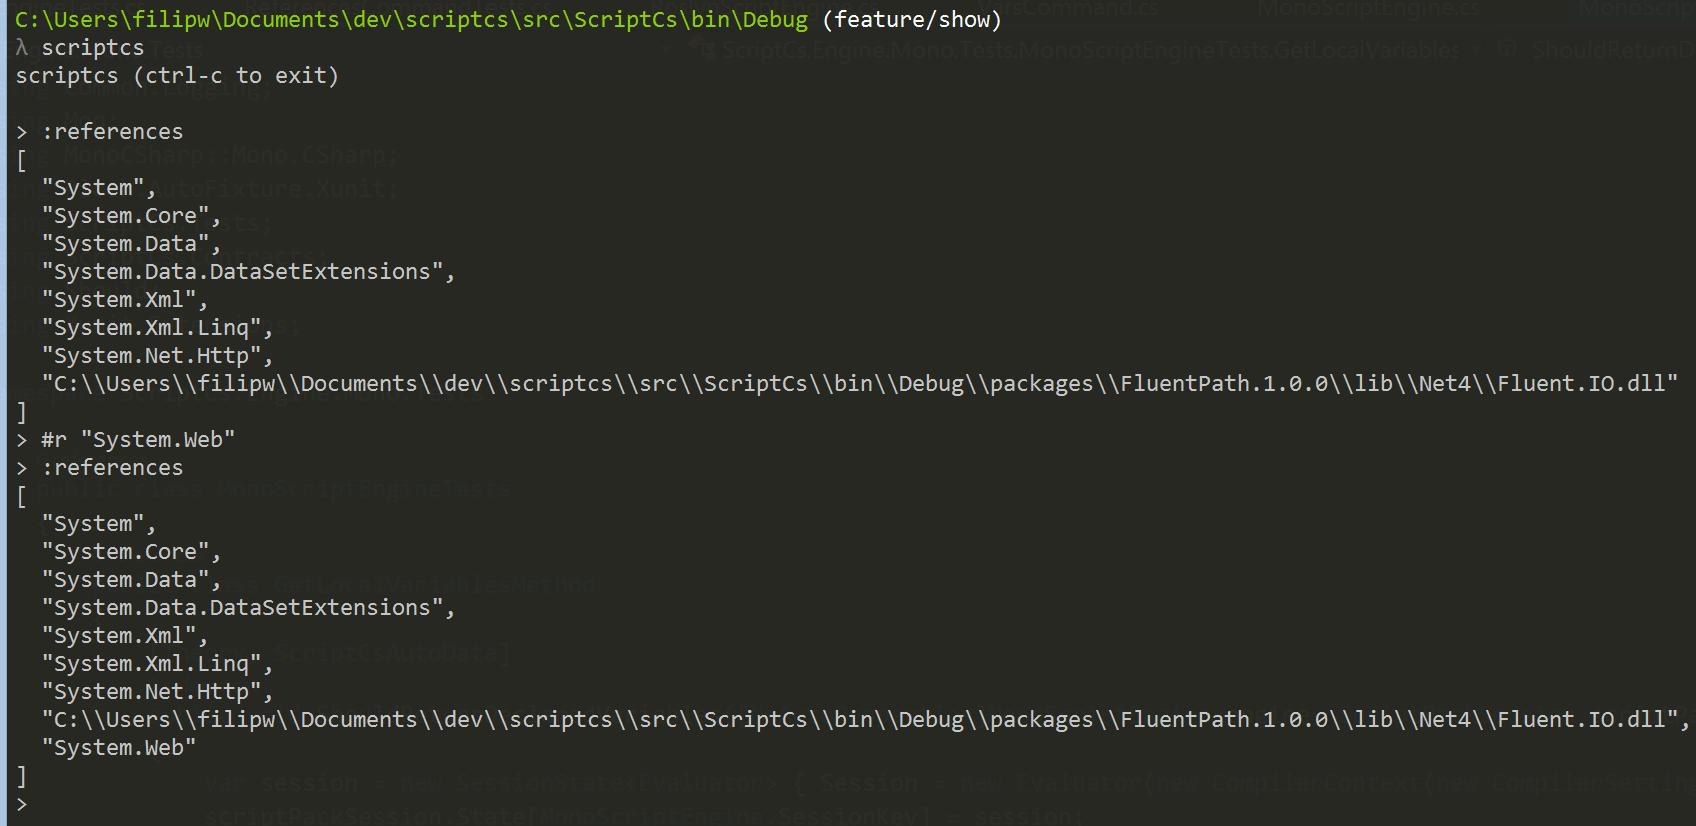 screenshot 2014-09-09 17 33 59